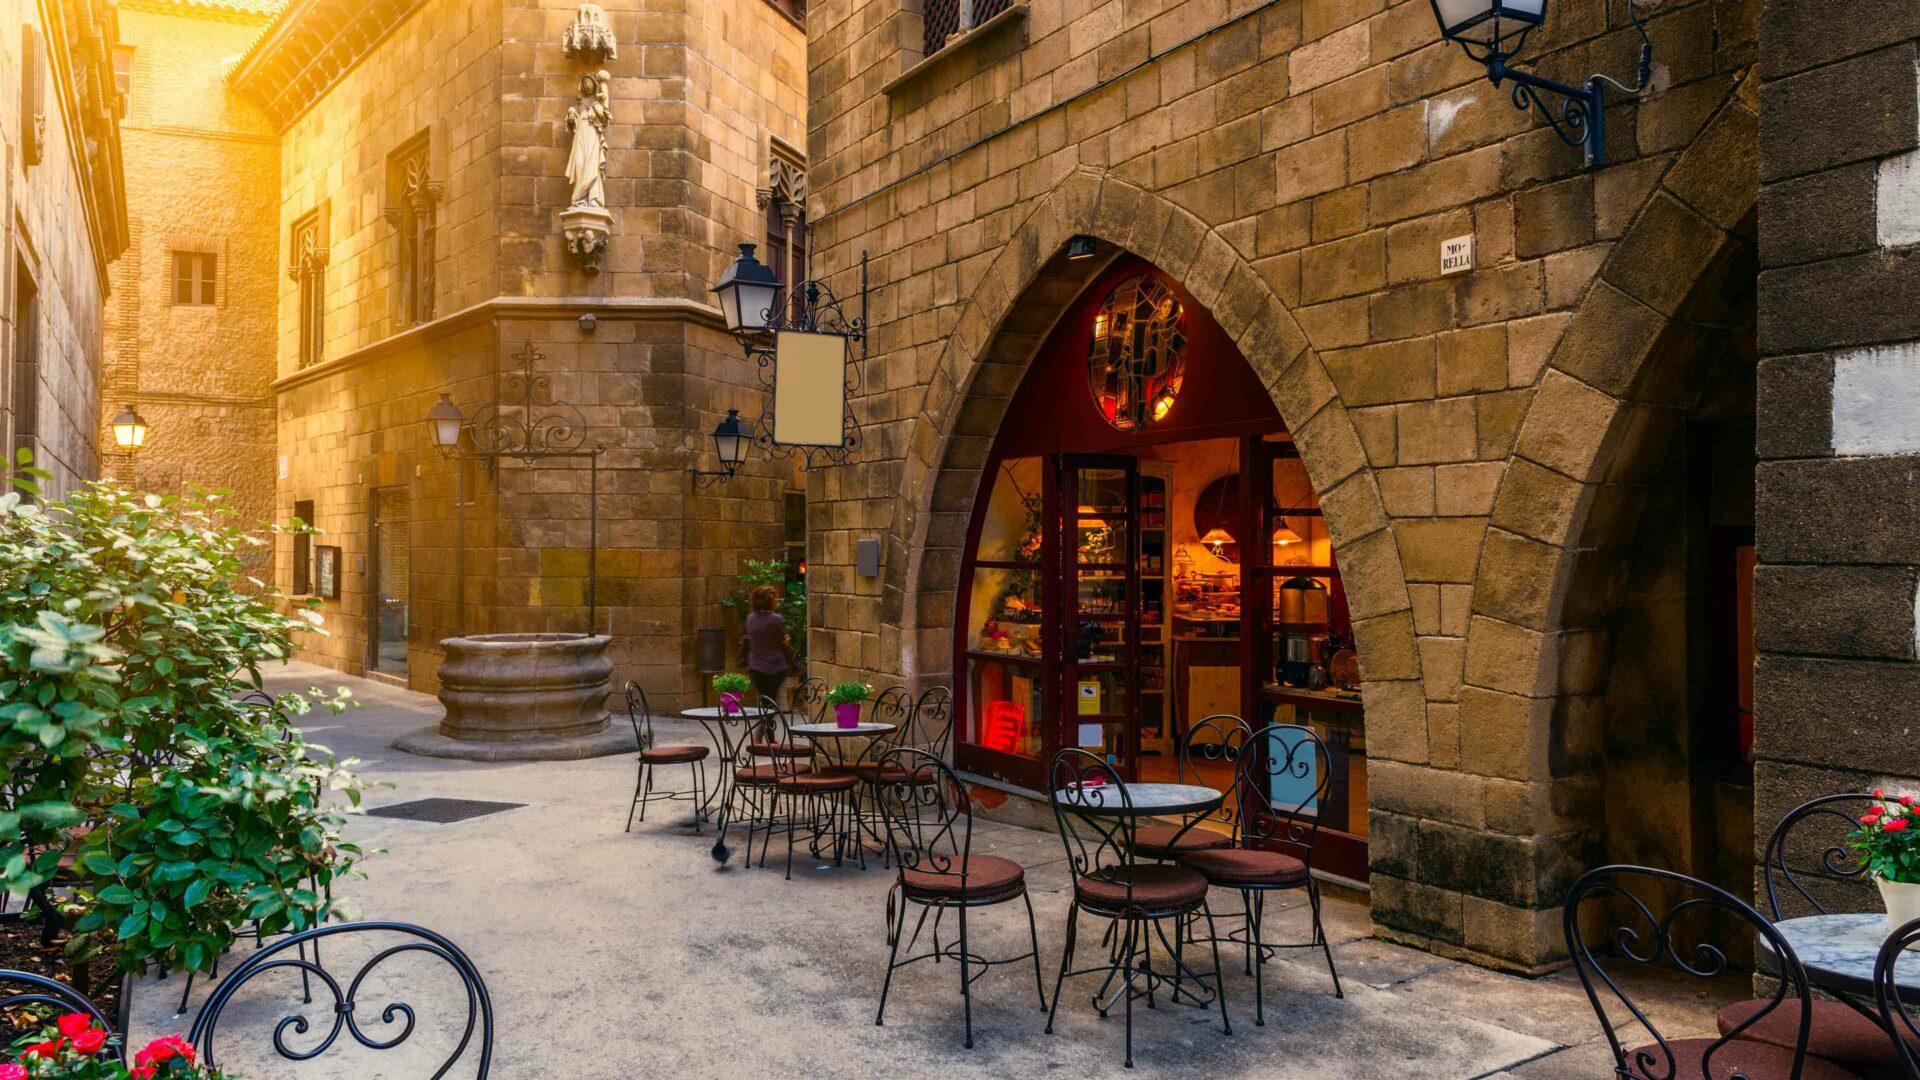 Catalonie Barcelona restaurant